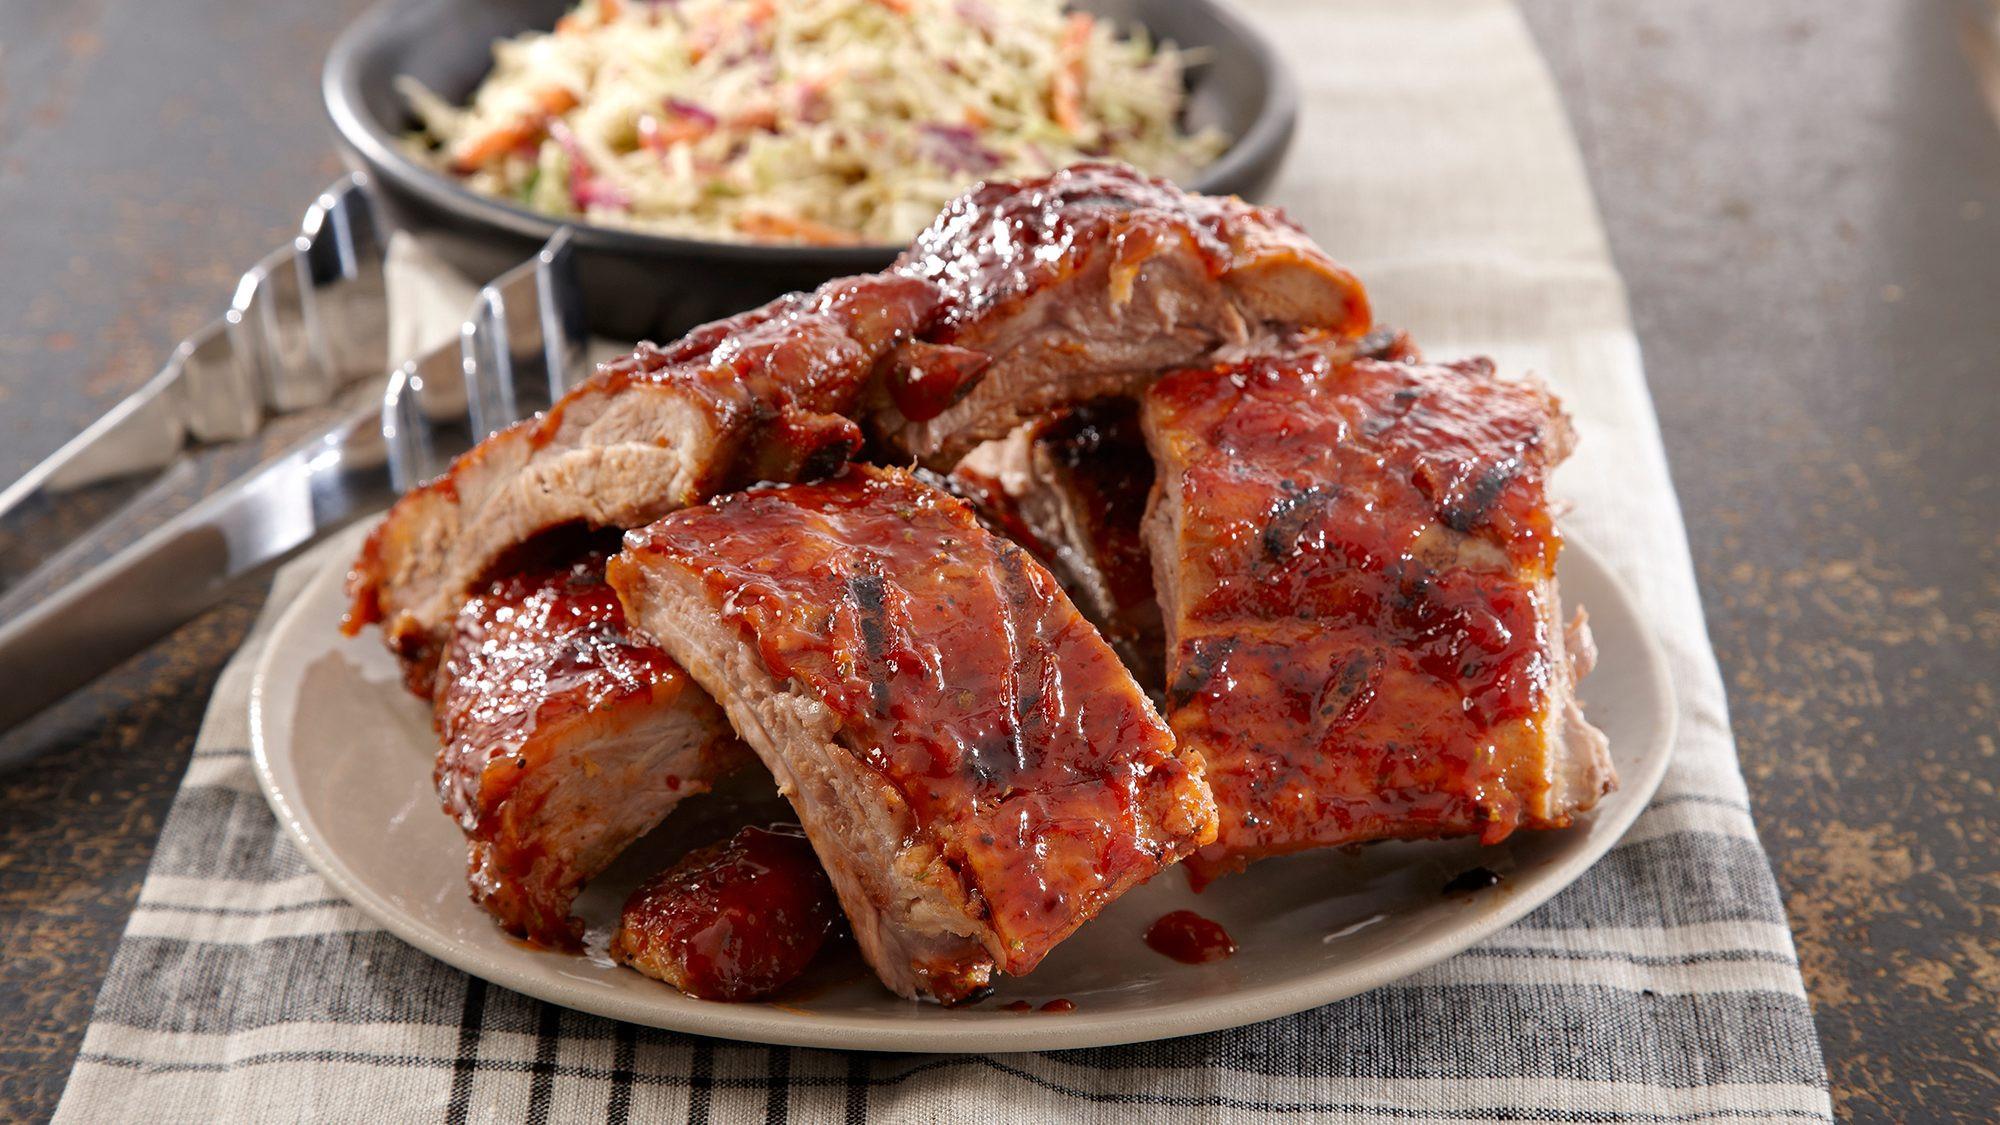 Grilling Pork Ribs  Mesquite BBQ Pork Ribs